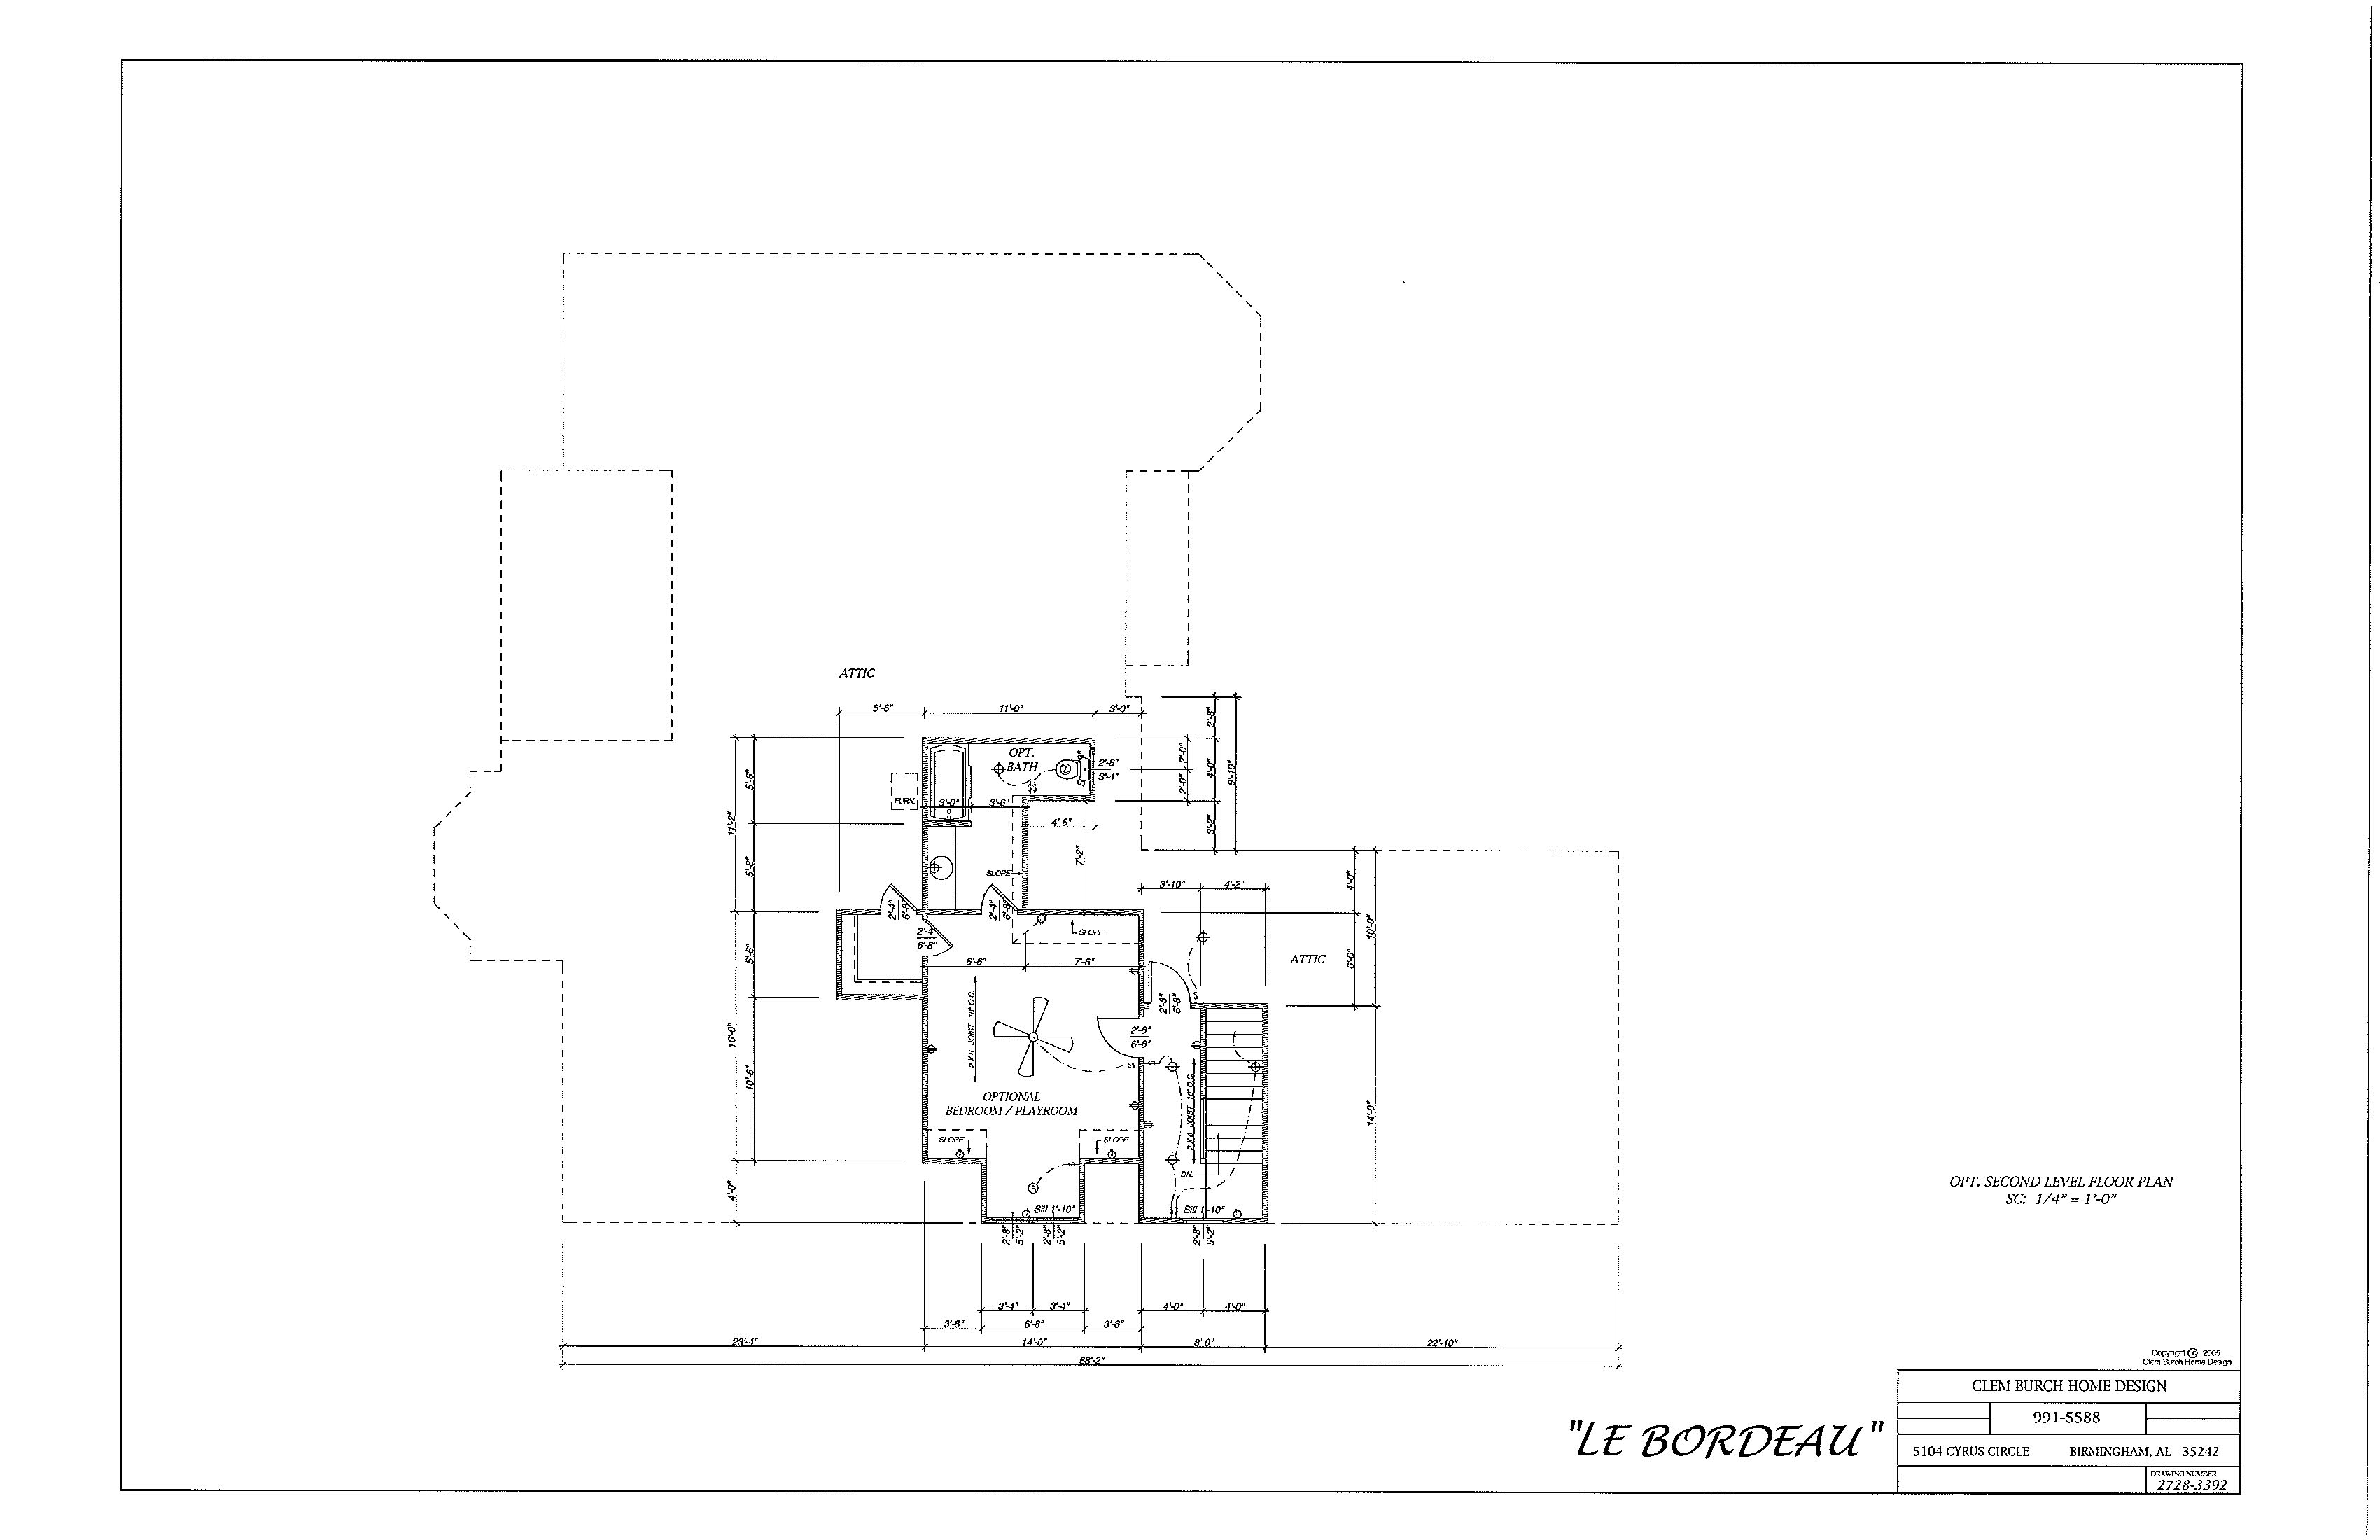 Le_Bordeau Floor Plan 2nd